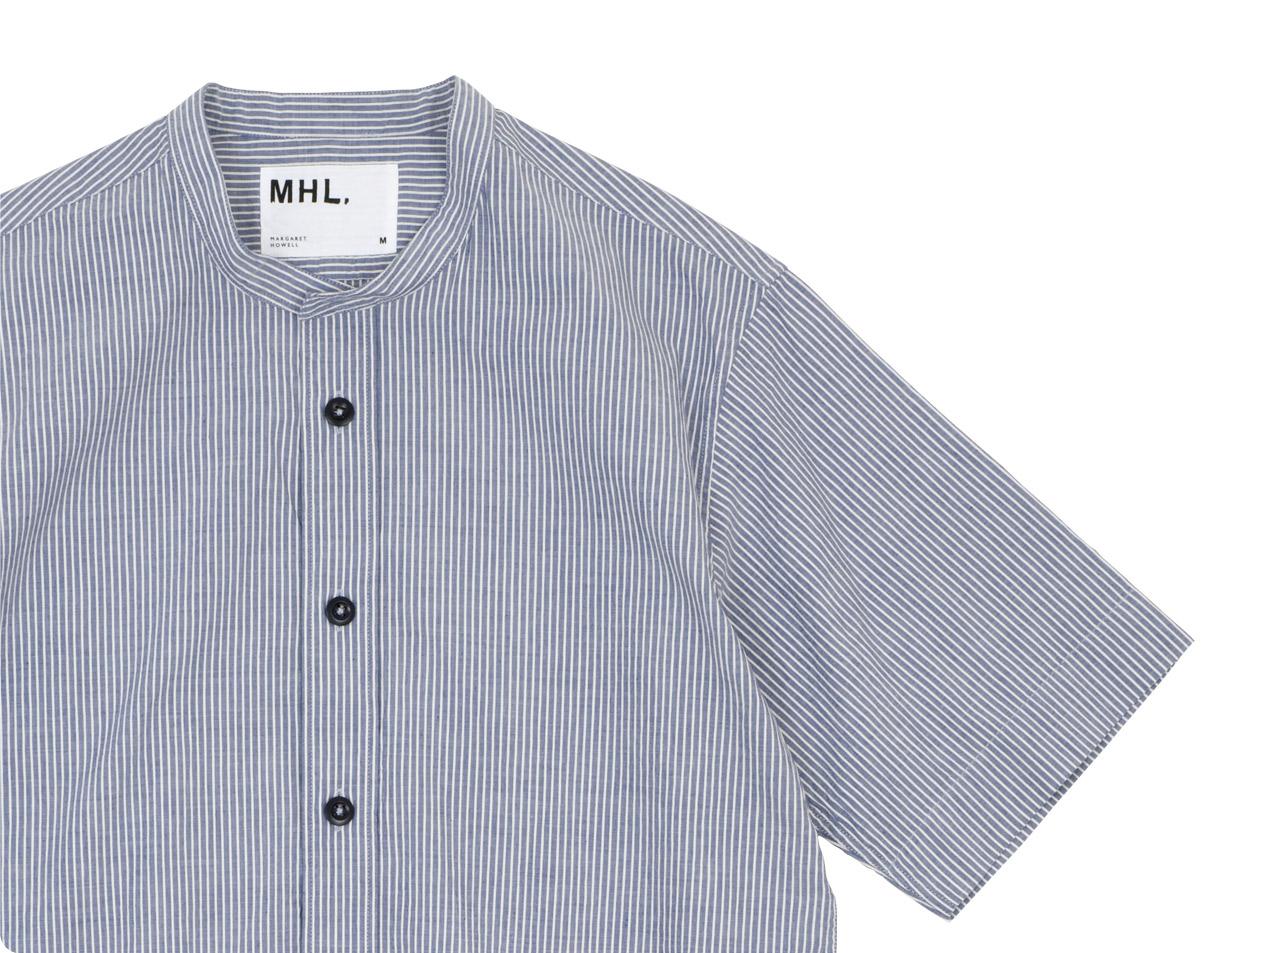 MHL. COTTON LINEN STRIPE S/S SHIRTS 〔メンズ〕